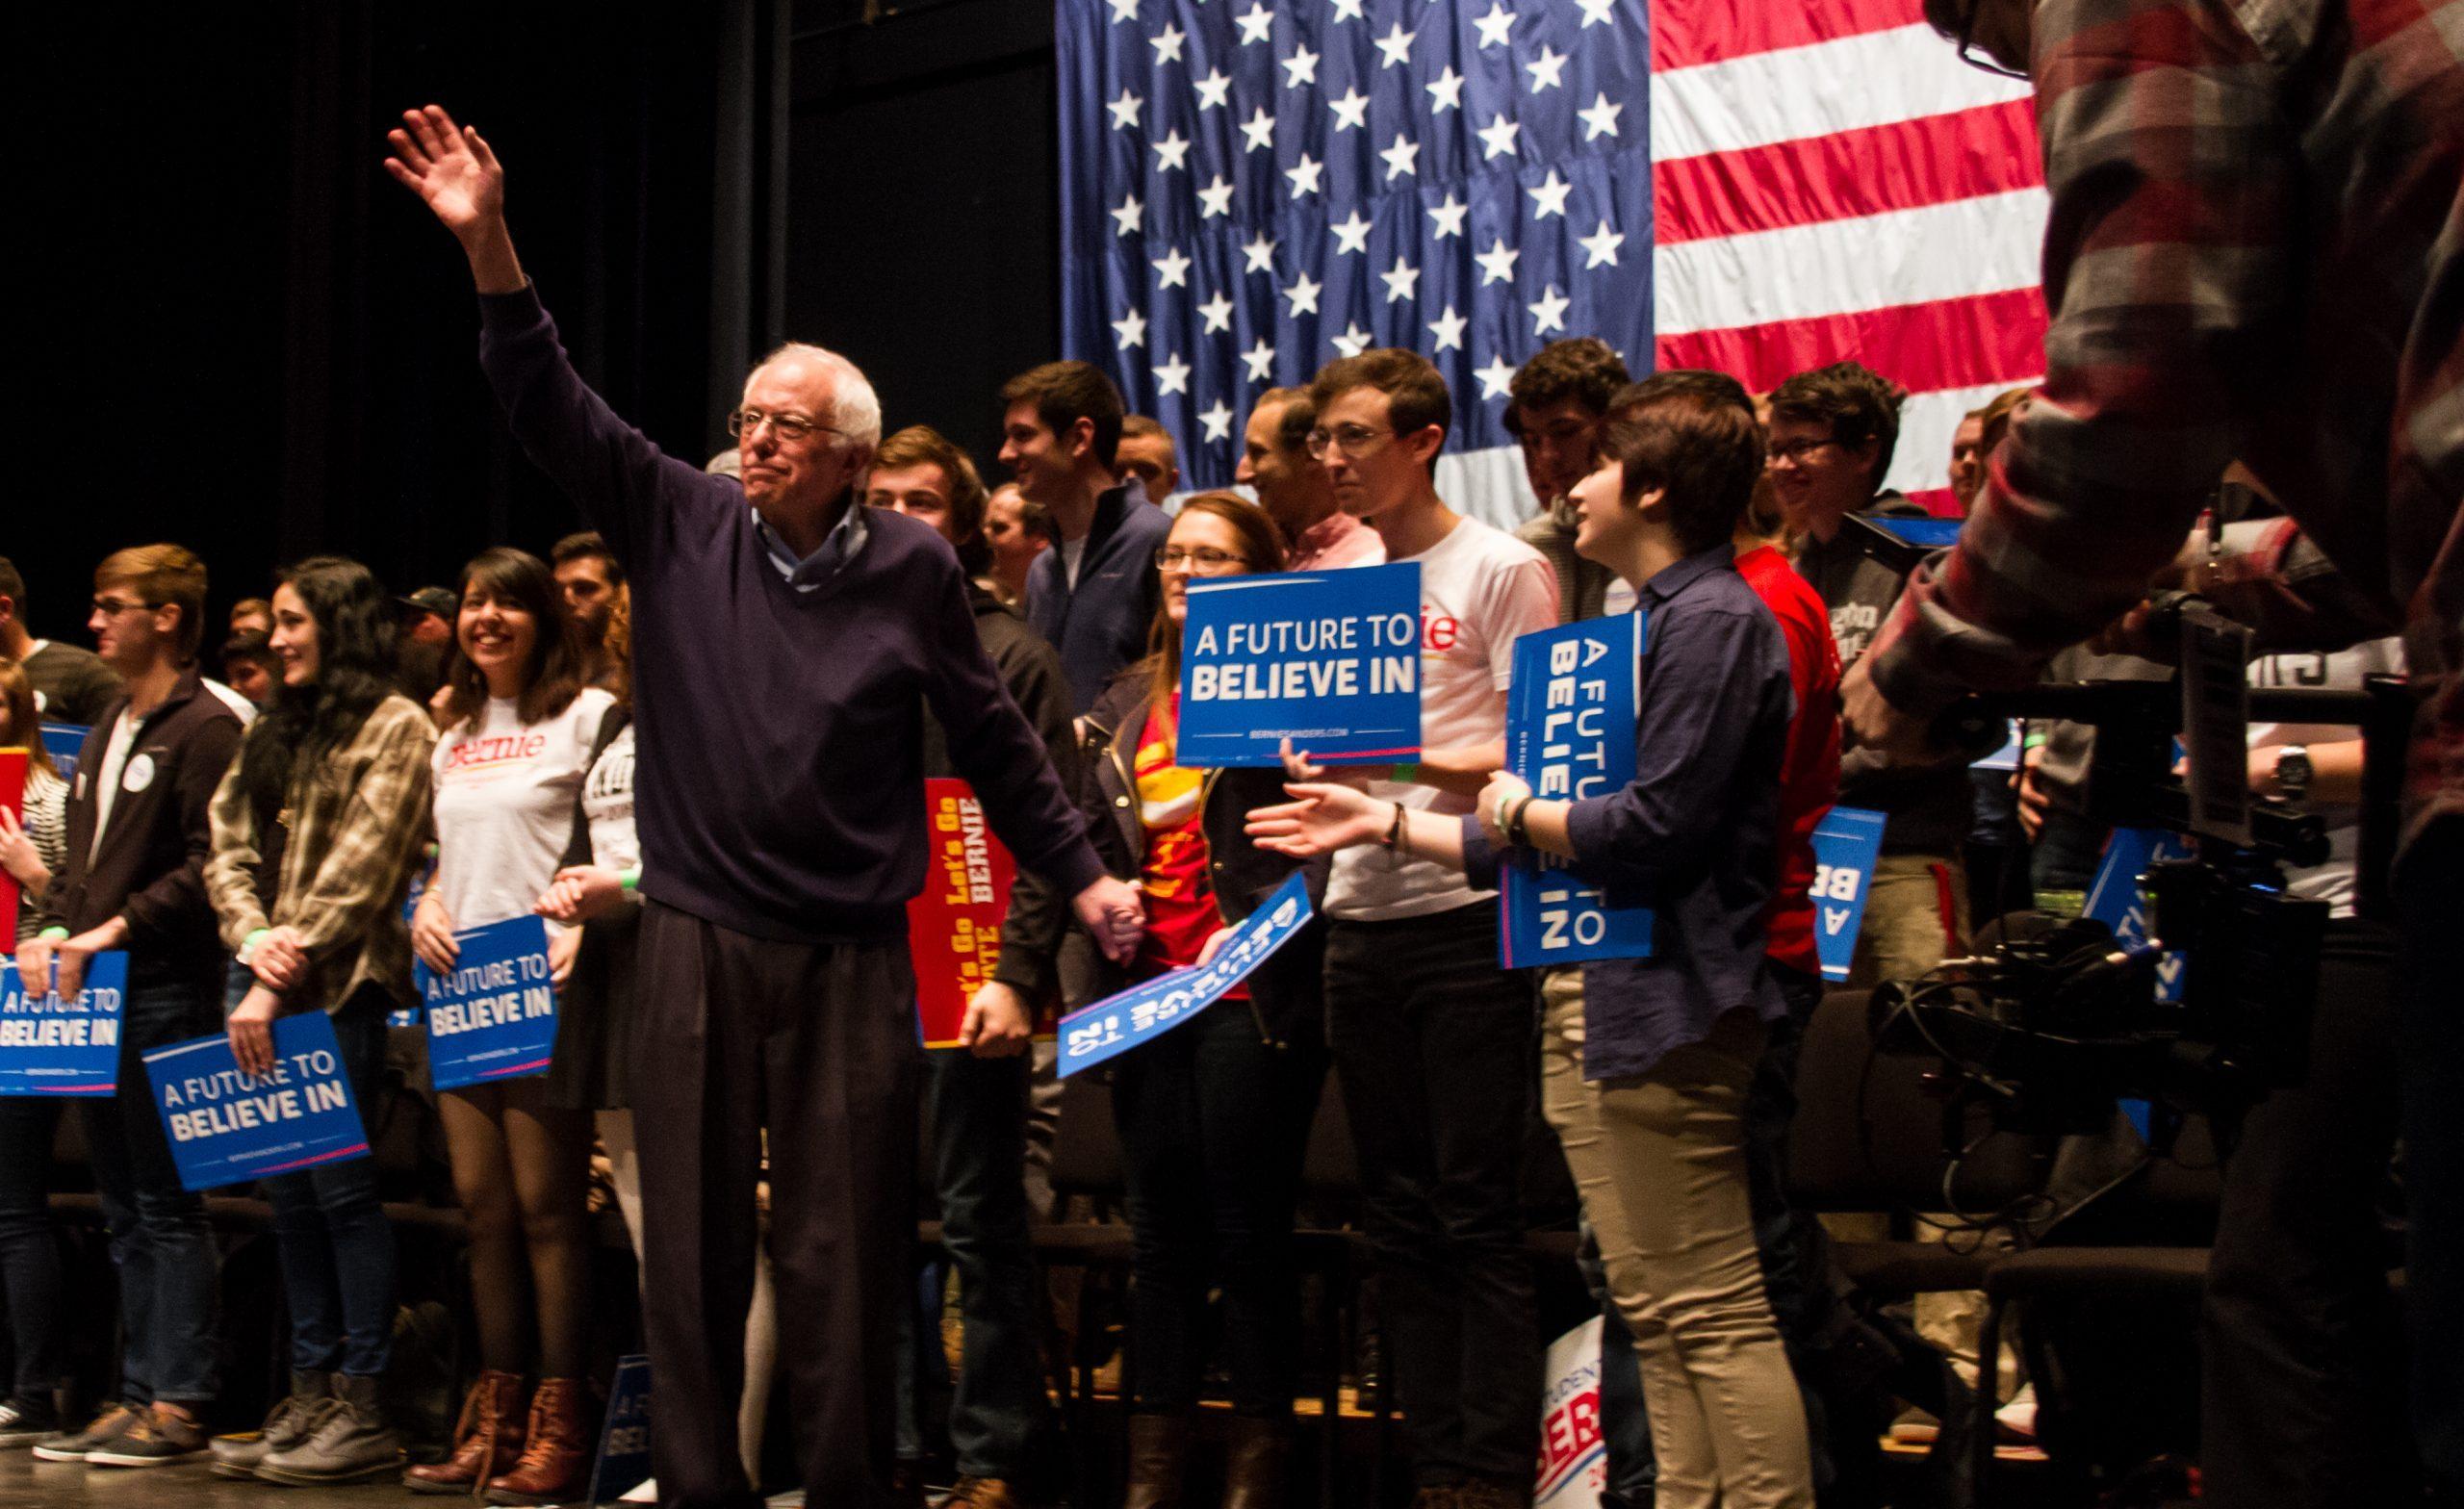 Sanders leads in Illinois, North Carolina and Texas polls